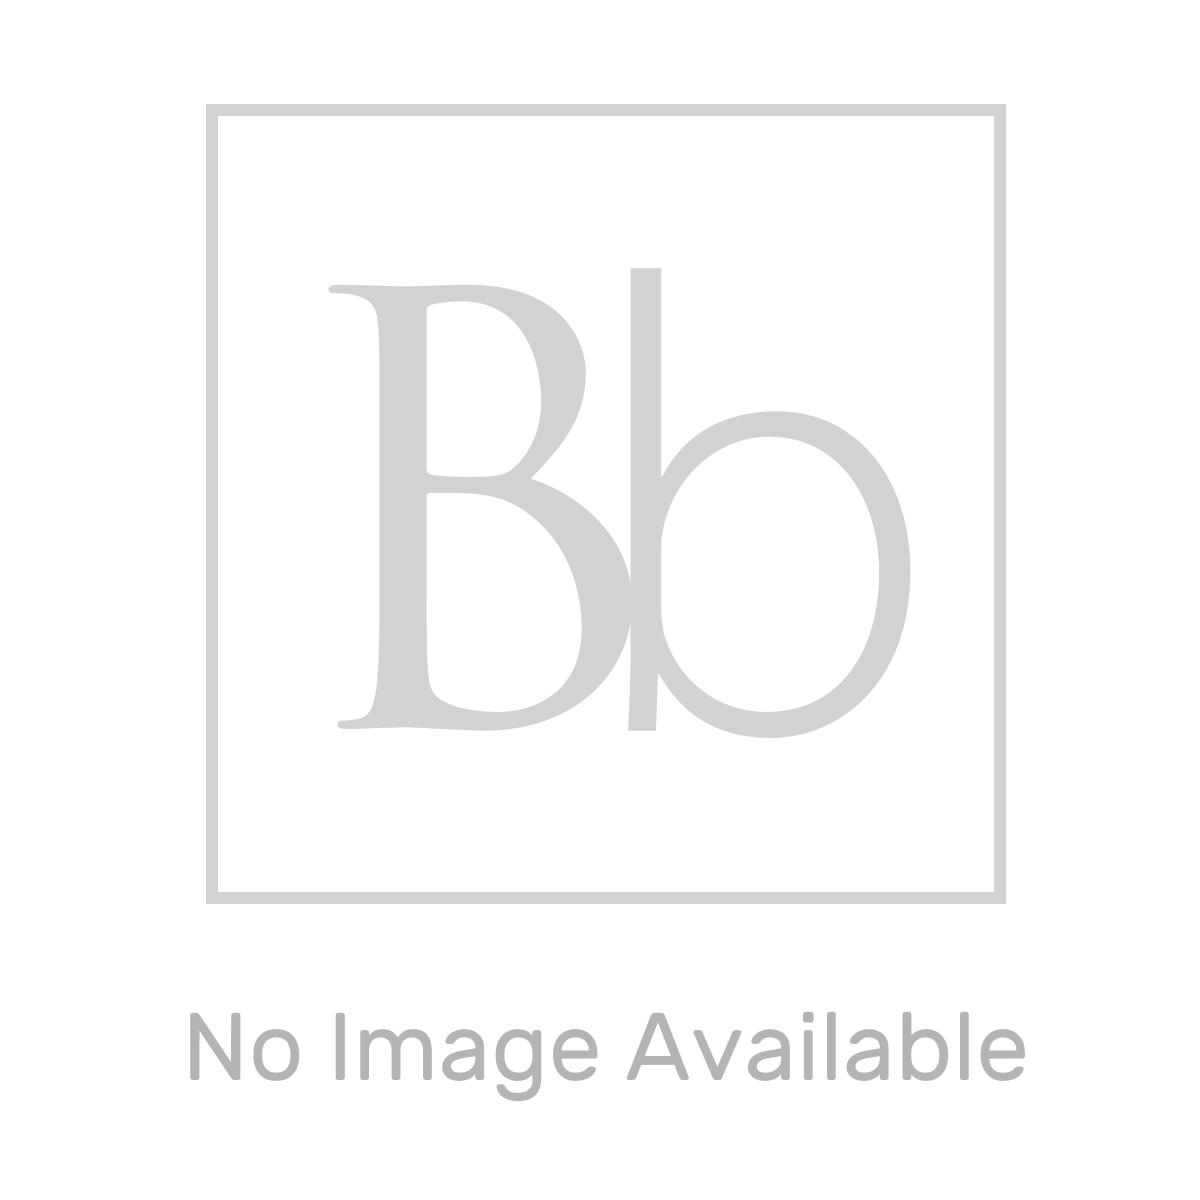 Nuie Athena Gloss White 4 Door Floor Standing Vanity Unit with Ceramic Double Basin 1200mm